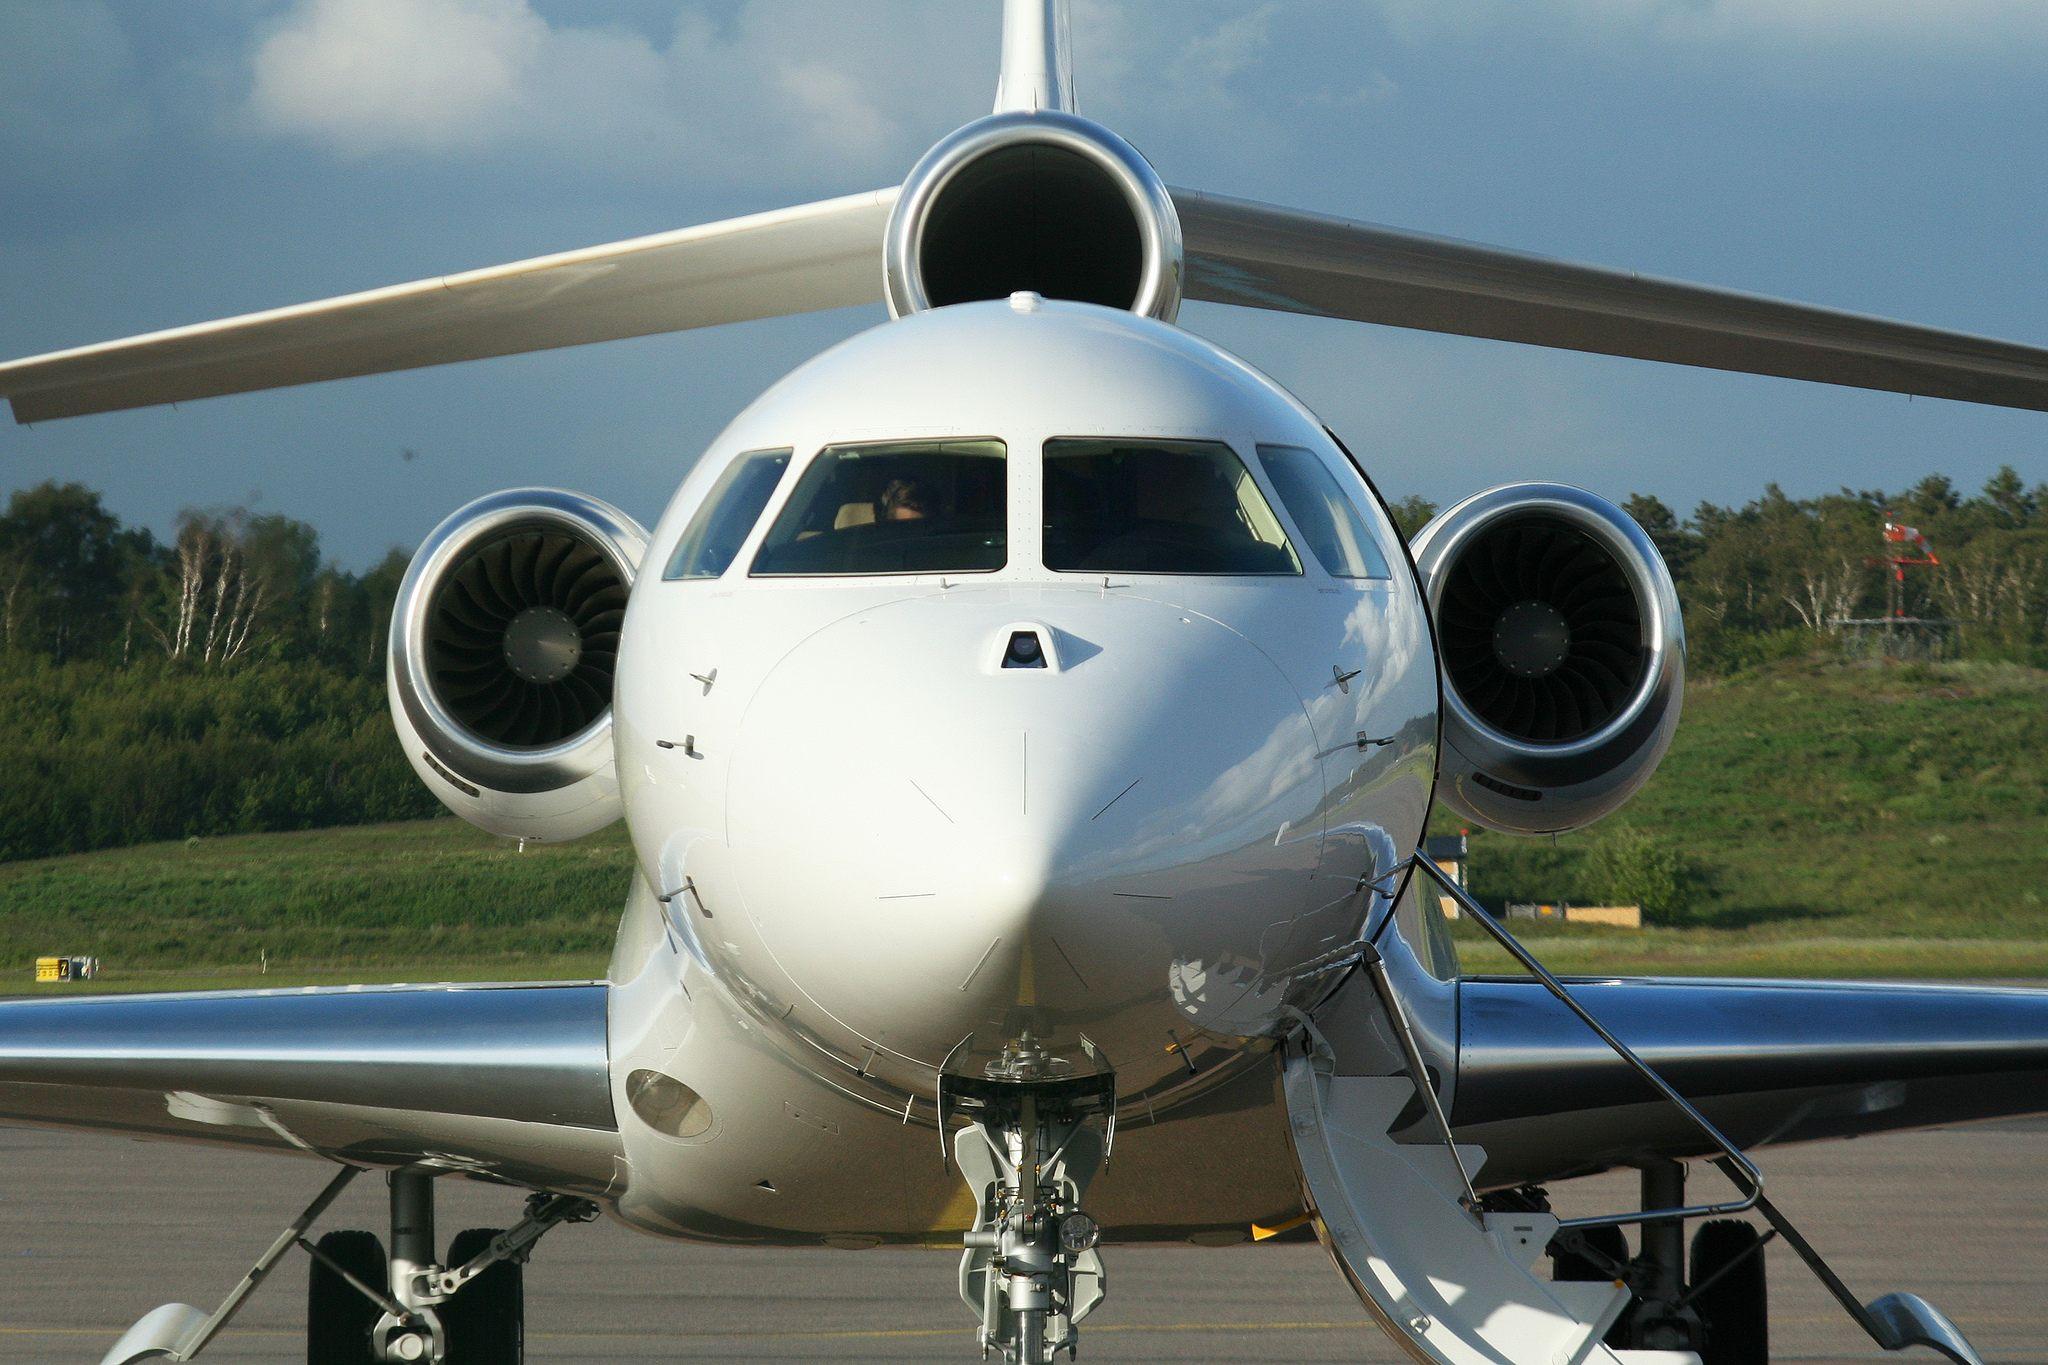 Dassault Falcon 7X 'OY-VIK' par Alan Wilson sous (CC BY-SA 2.0) - https://www.flickr.com/photos/ajw1970/7416828394/